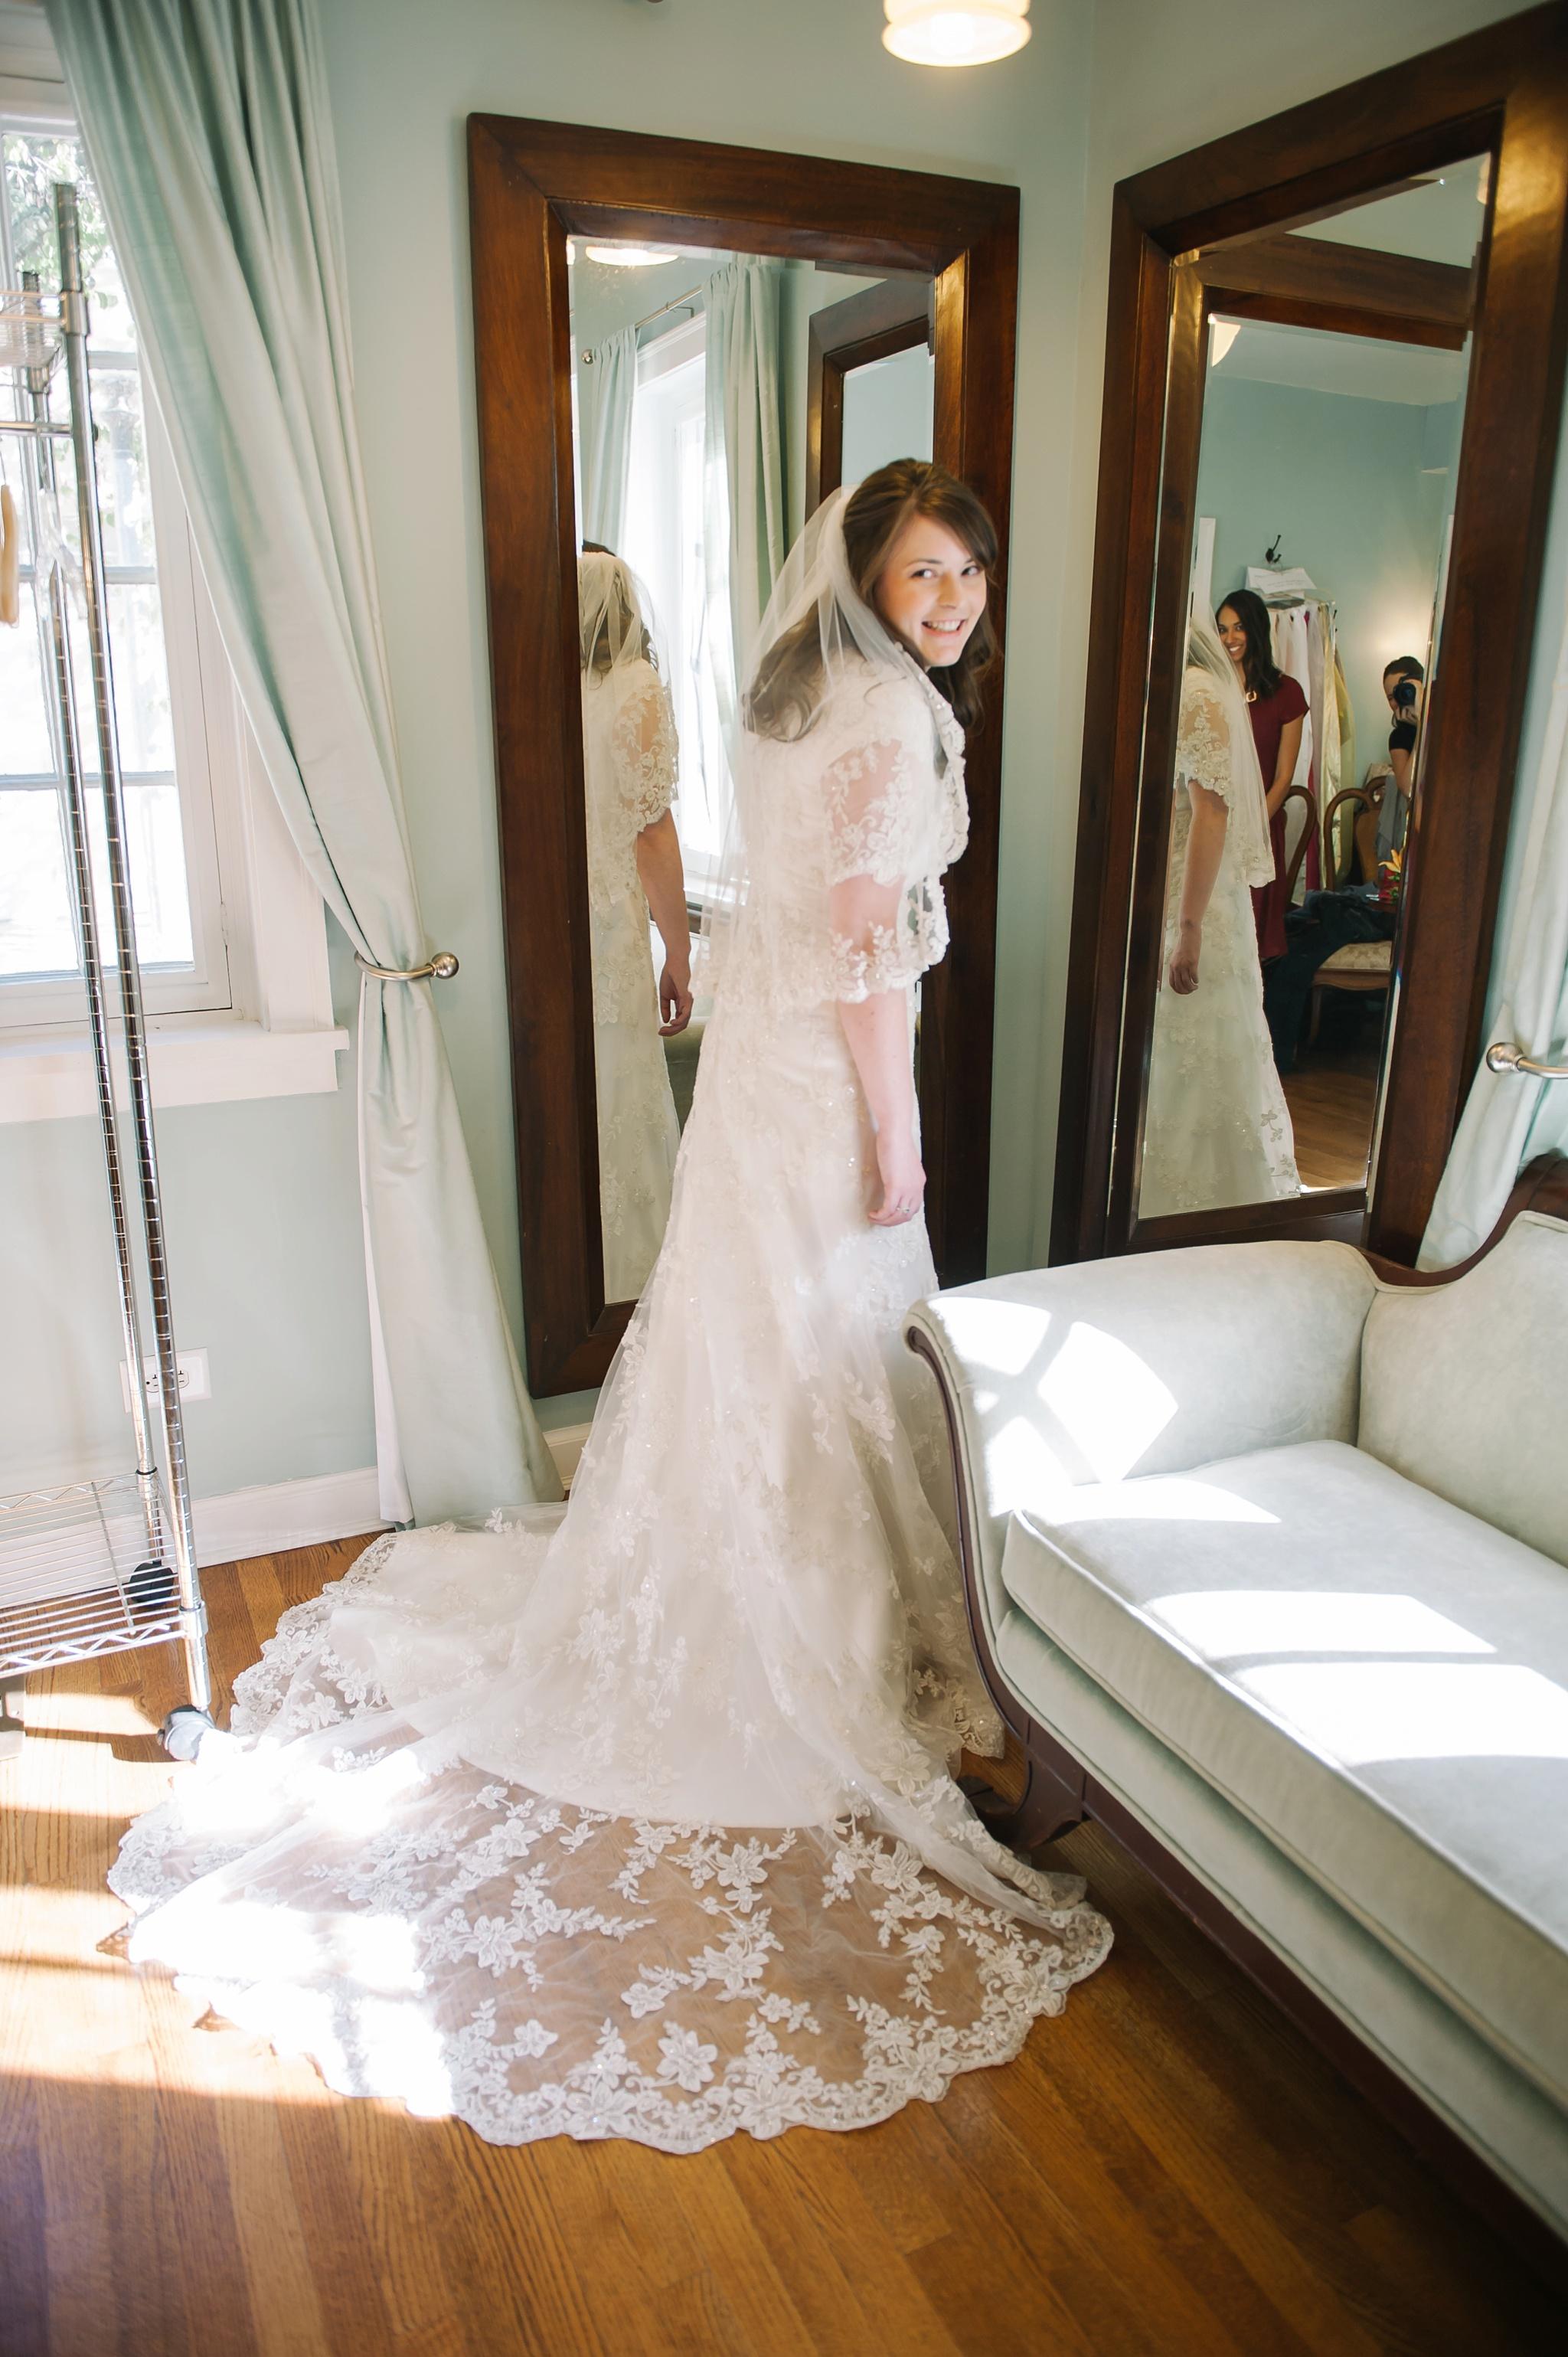 Park City Wedding Photographer Ali Sumsion 012